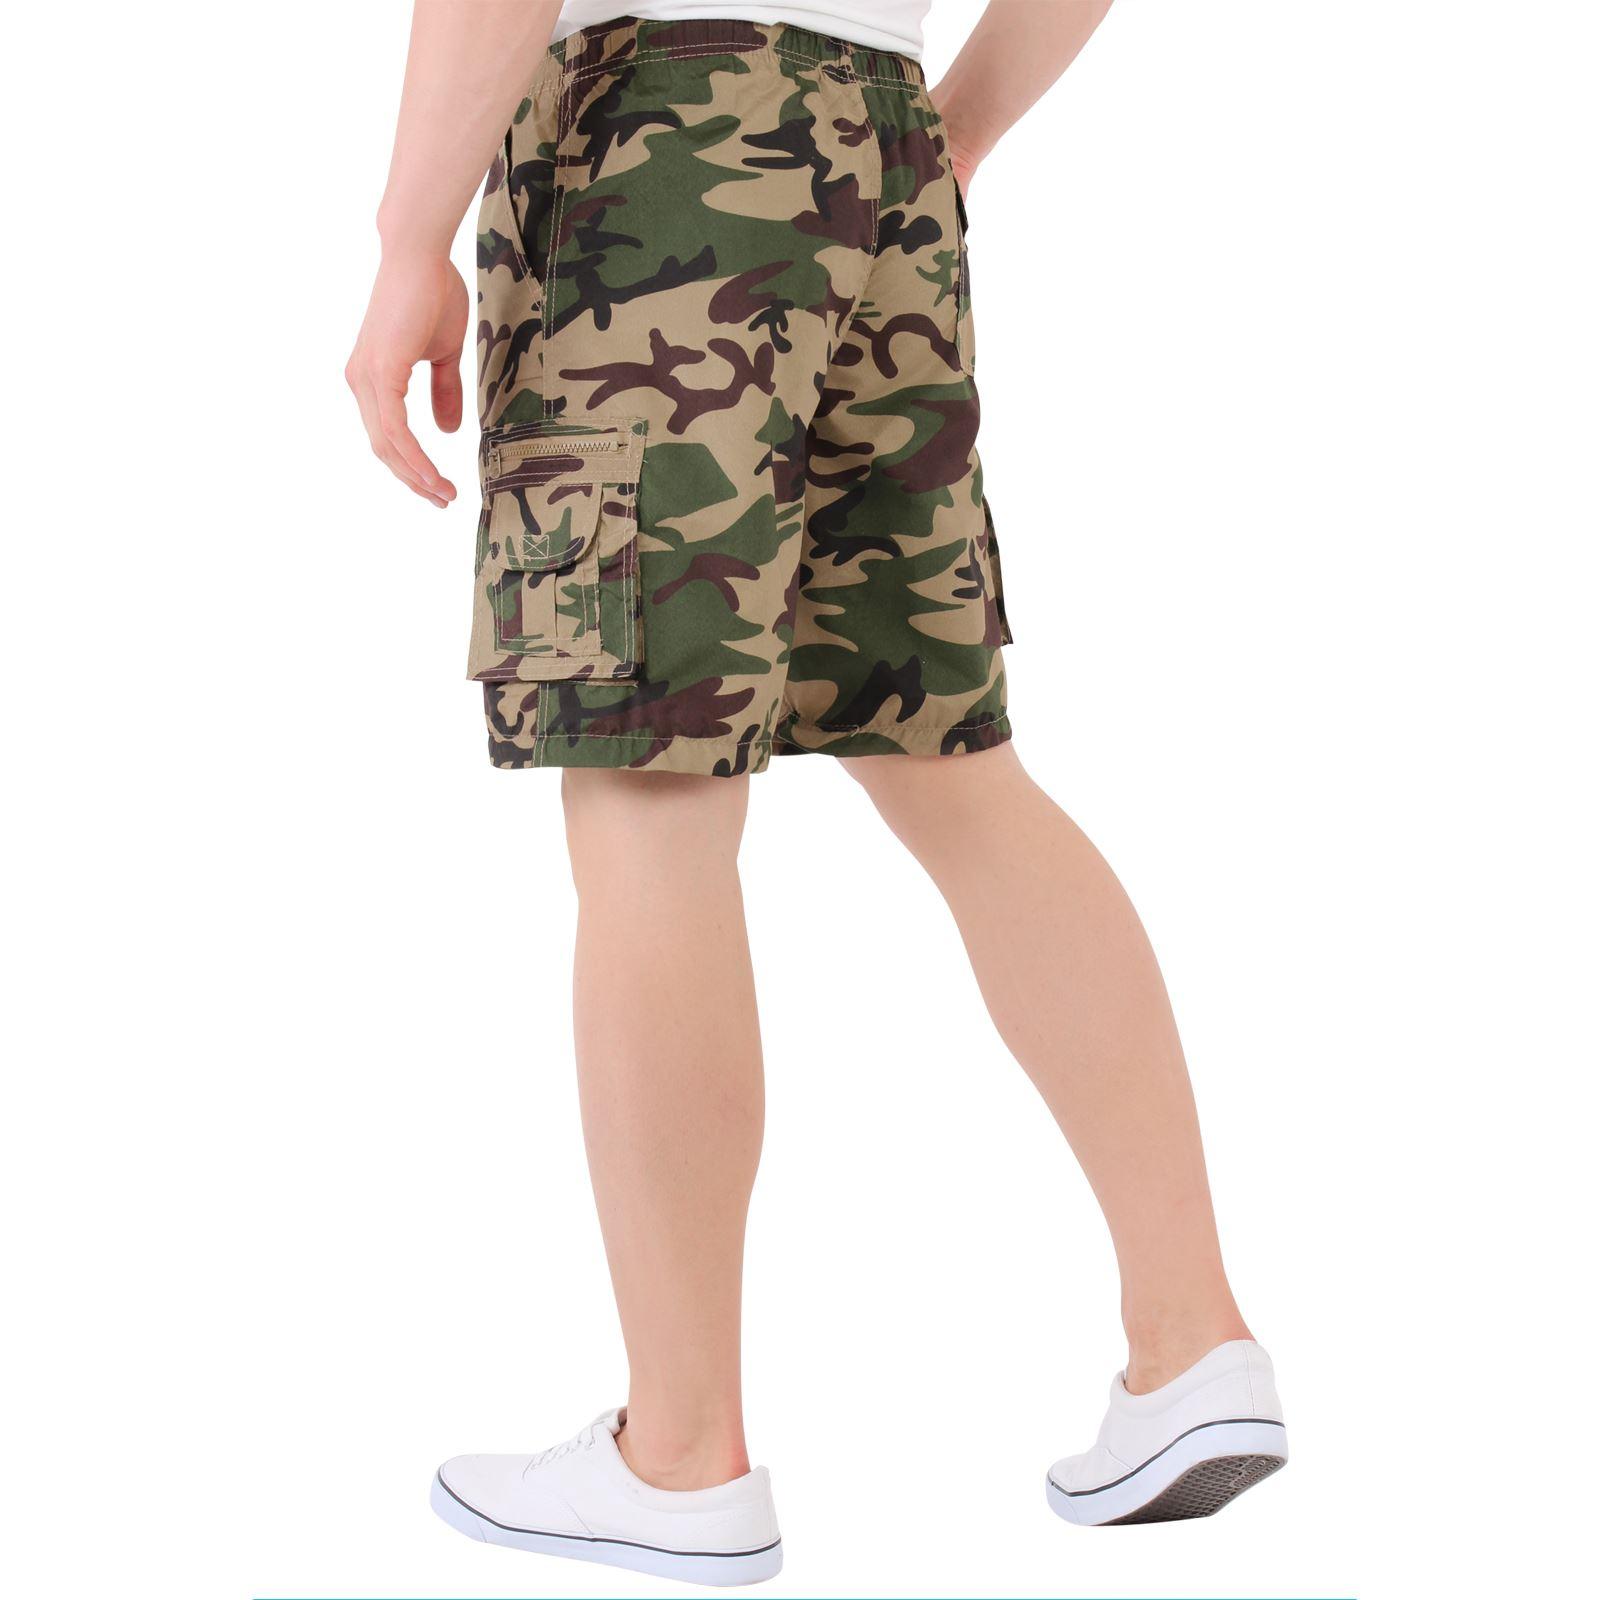 herren cargo shorts bermuda hose convertible camouflage. Black Bedroom Furniture Sets. Home Design Ideas